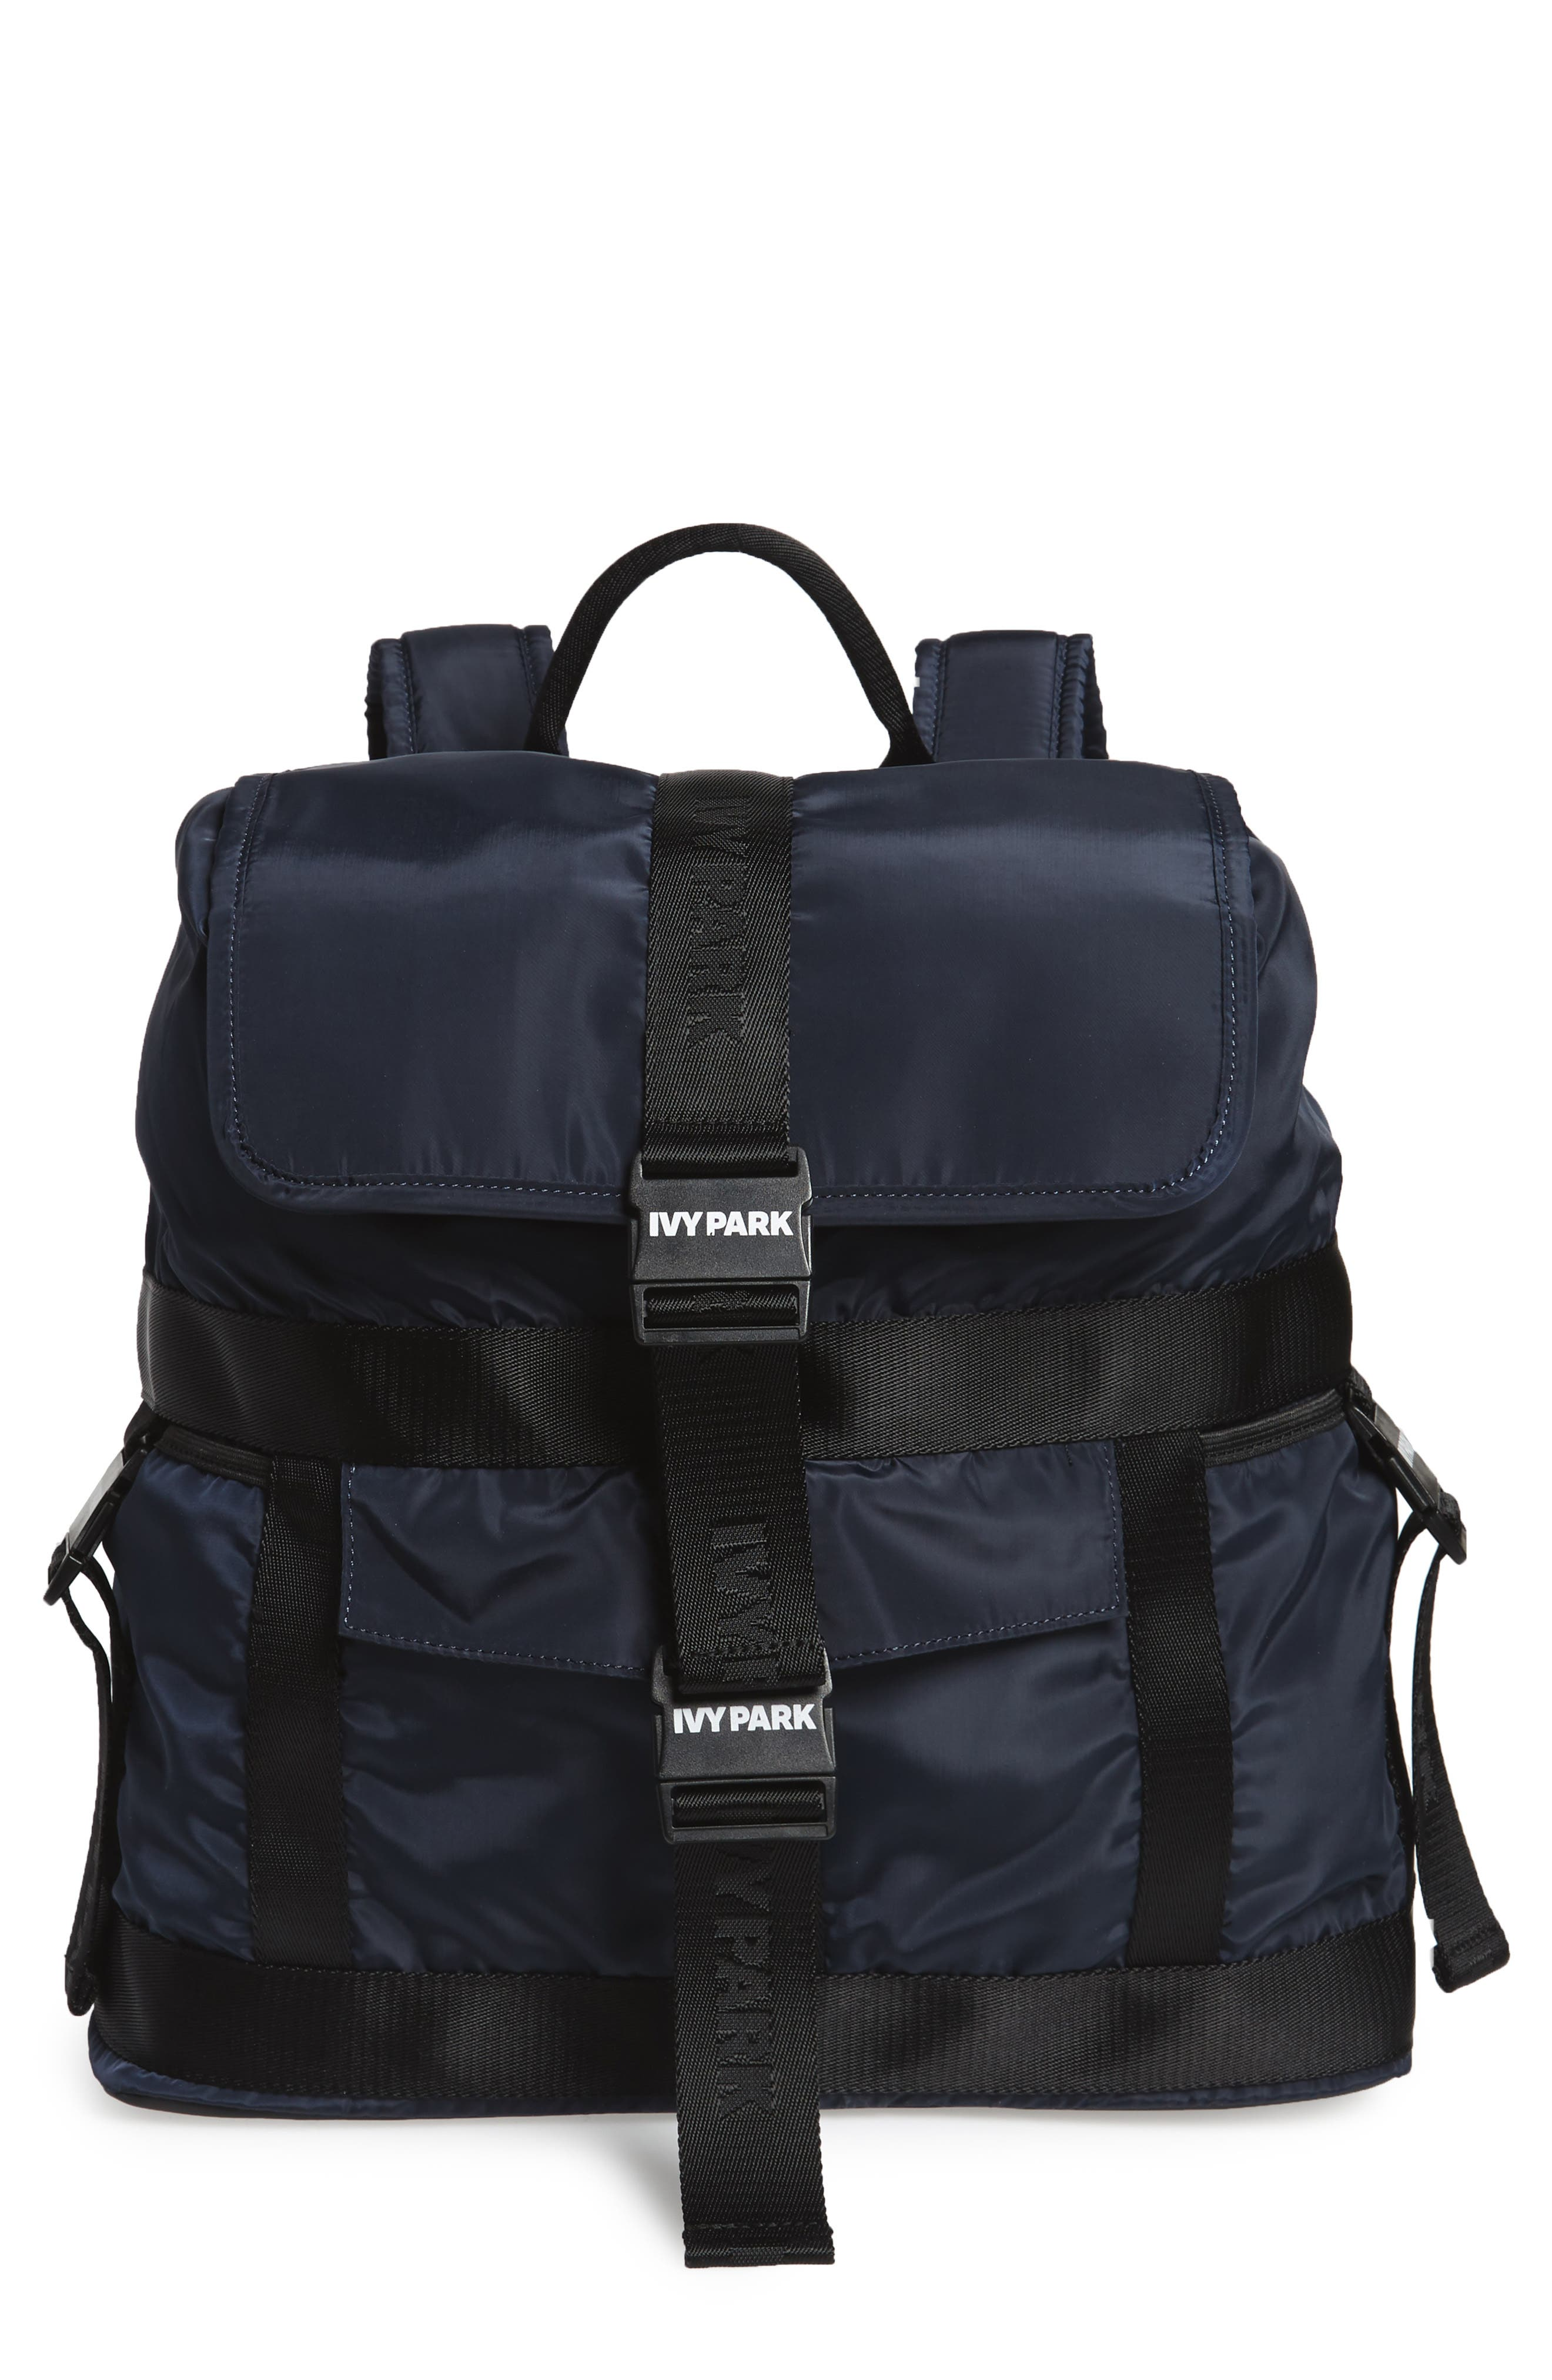 IVY PARK® Parachute Strap Backpack